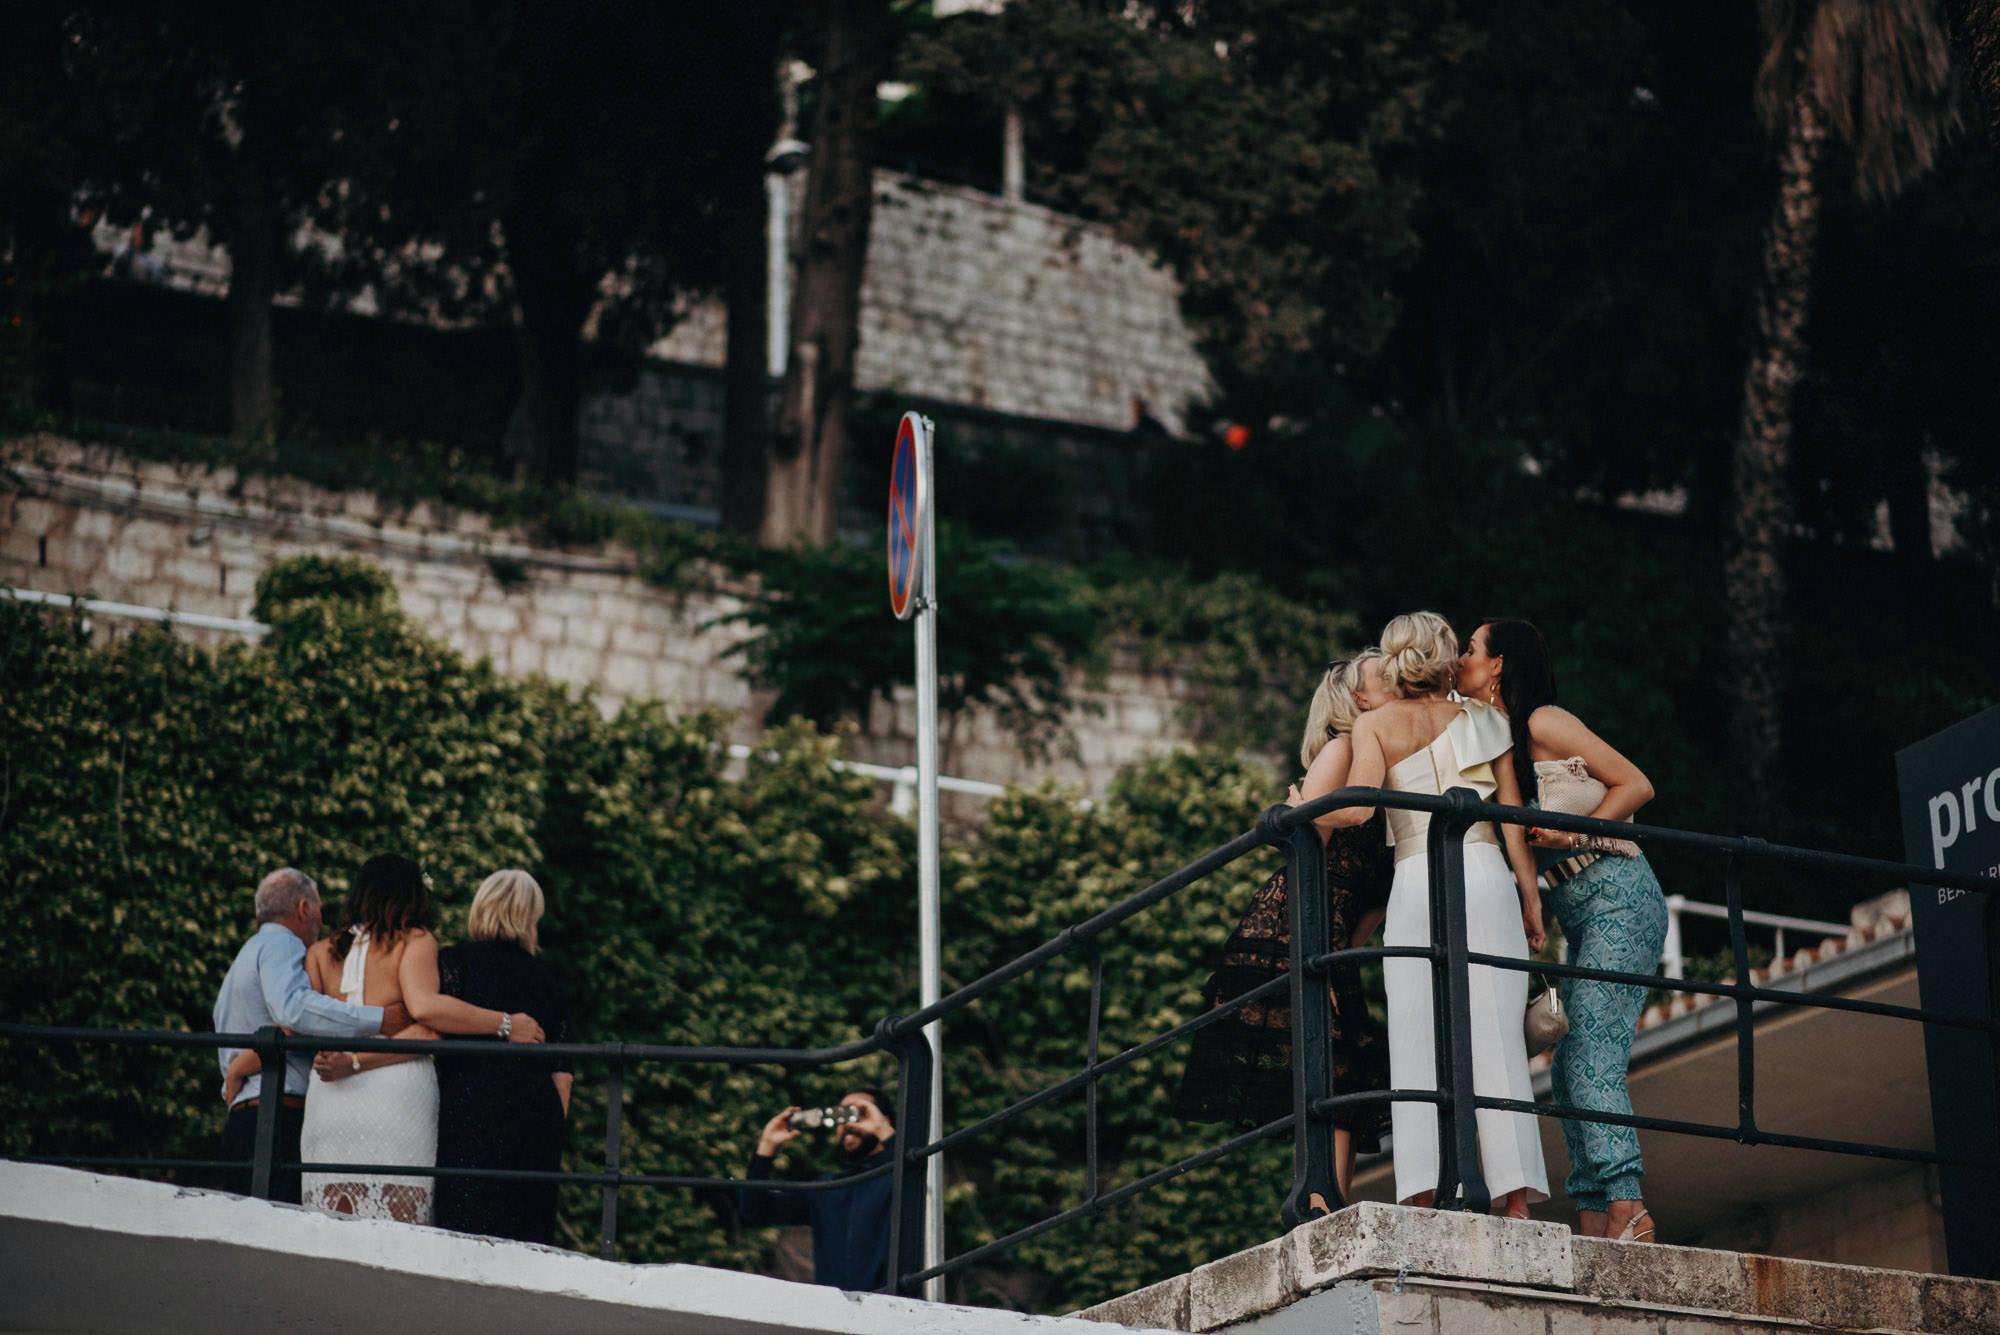 dubrovnik_croatia_wedding_photographer-jere_satamo-destination_weddings-072-web.jpg